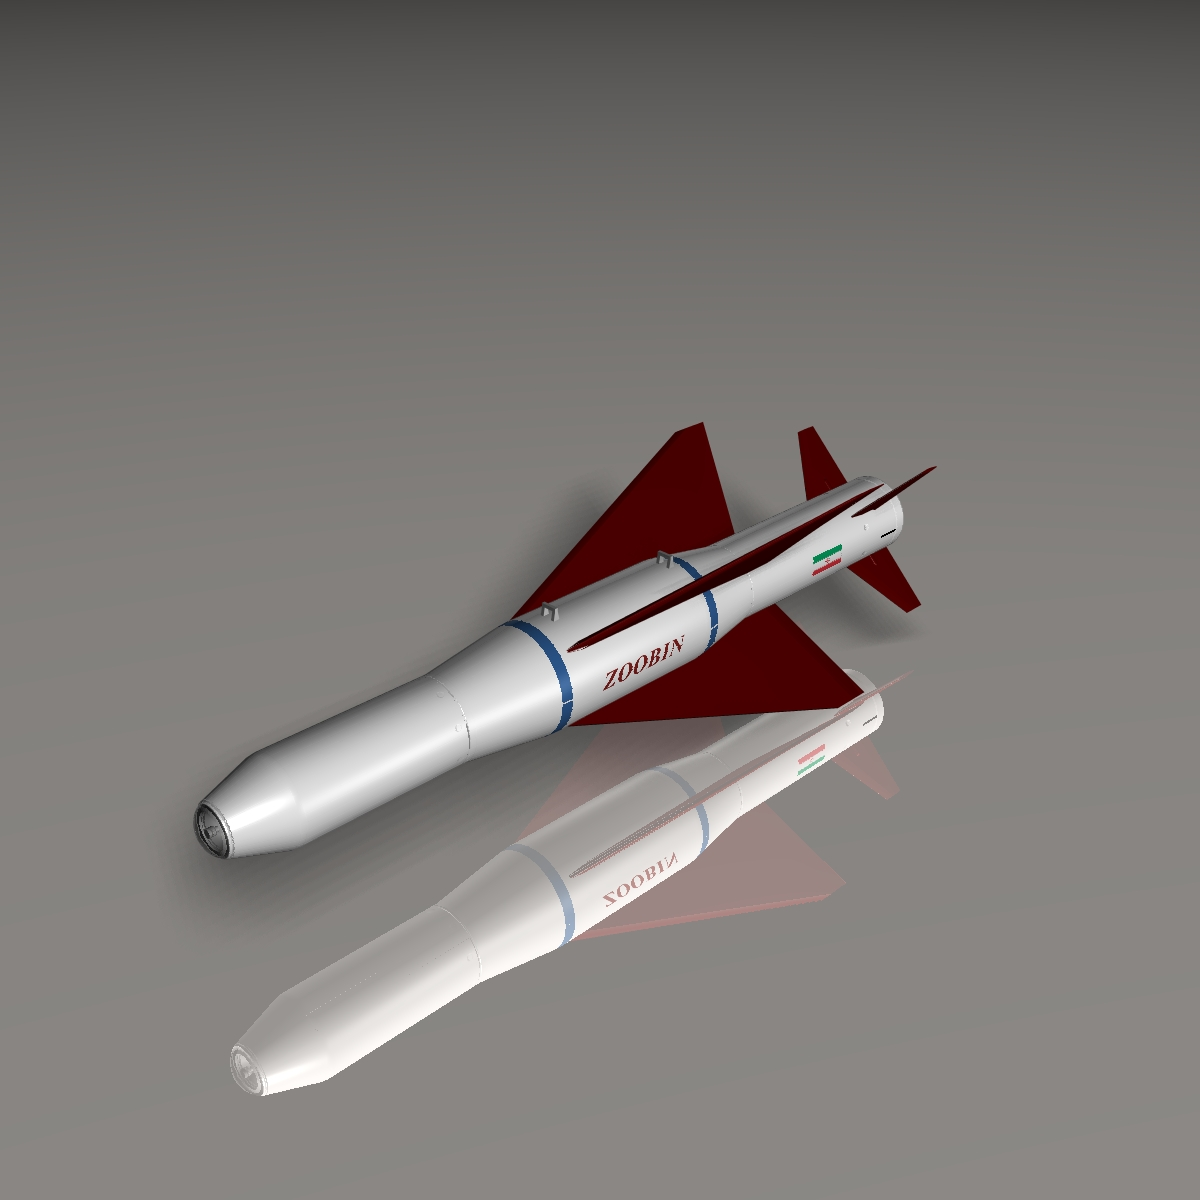 iranian agm-379 zoobin asm missile 3d model 3ds dxf fbx blend cob dae x obj 150584